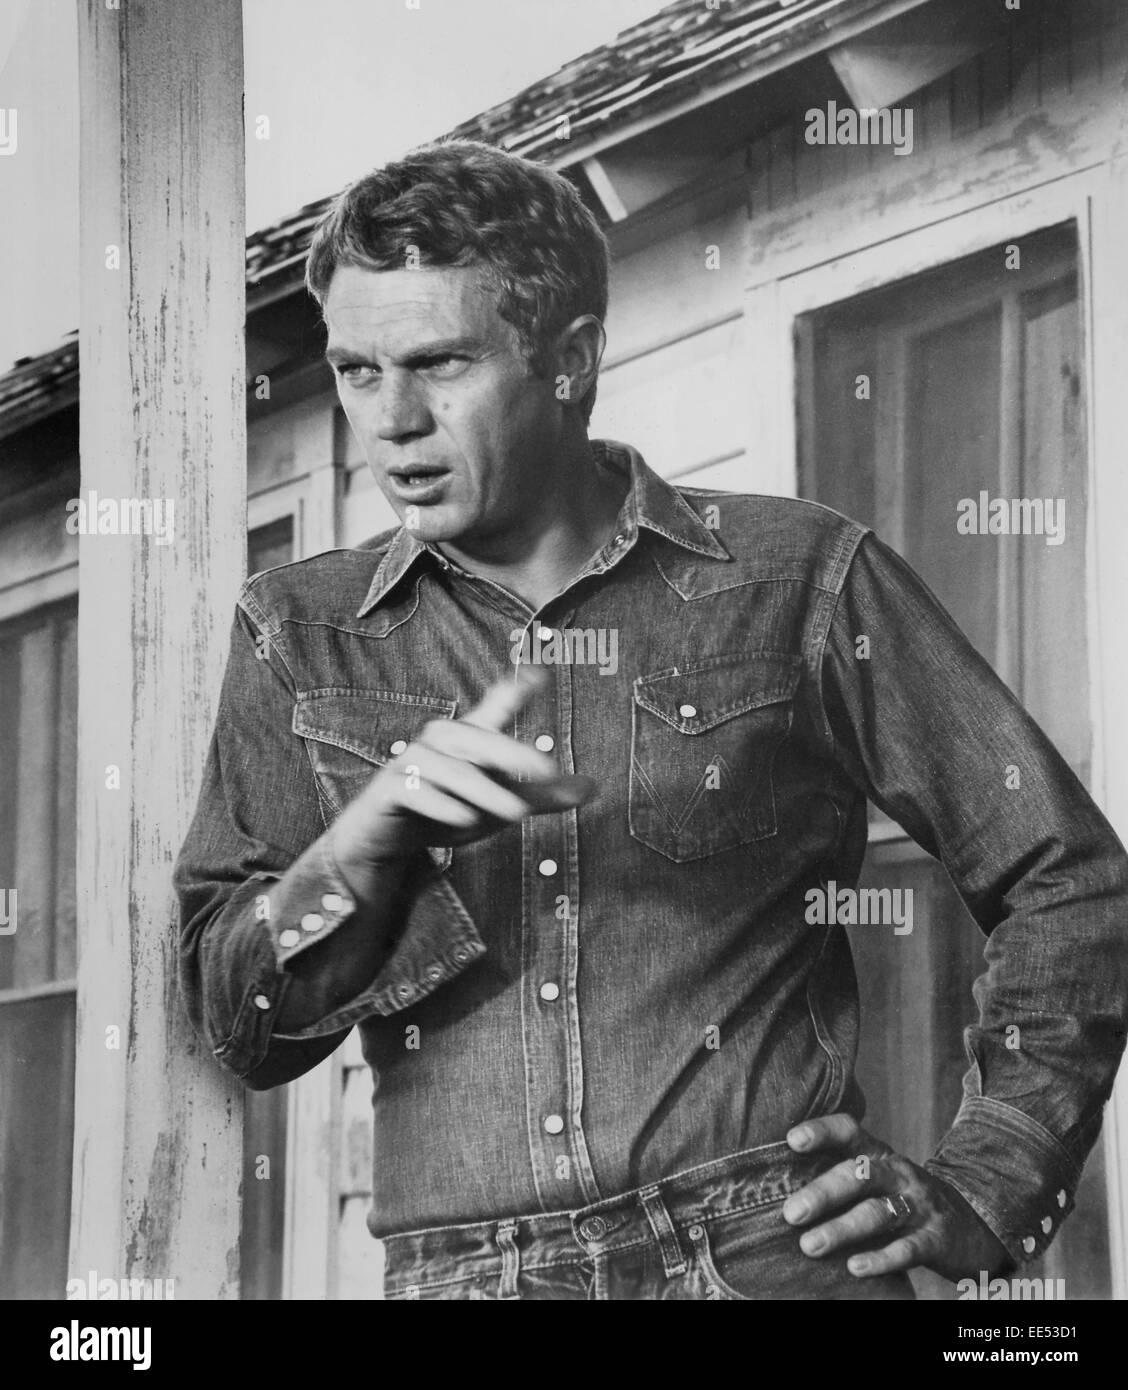 Steve McQueen, Portrait in Denim Shirt, on-set of the Film, 'Baby the Rain Must Fall', 1965, - Stock Image